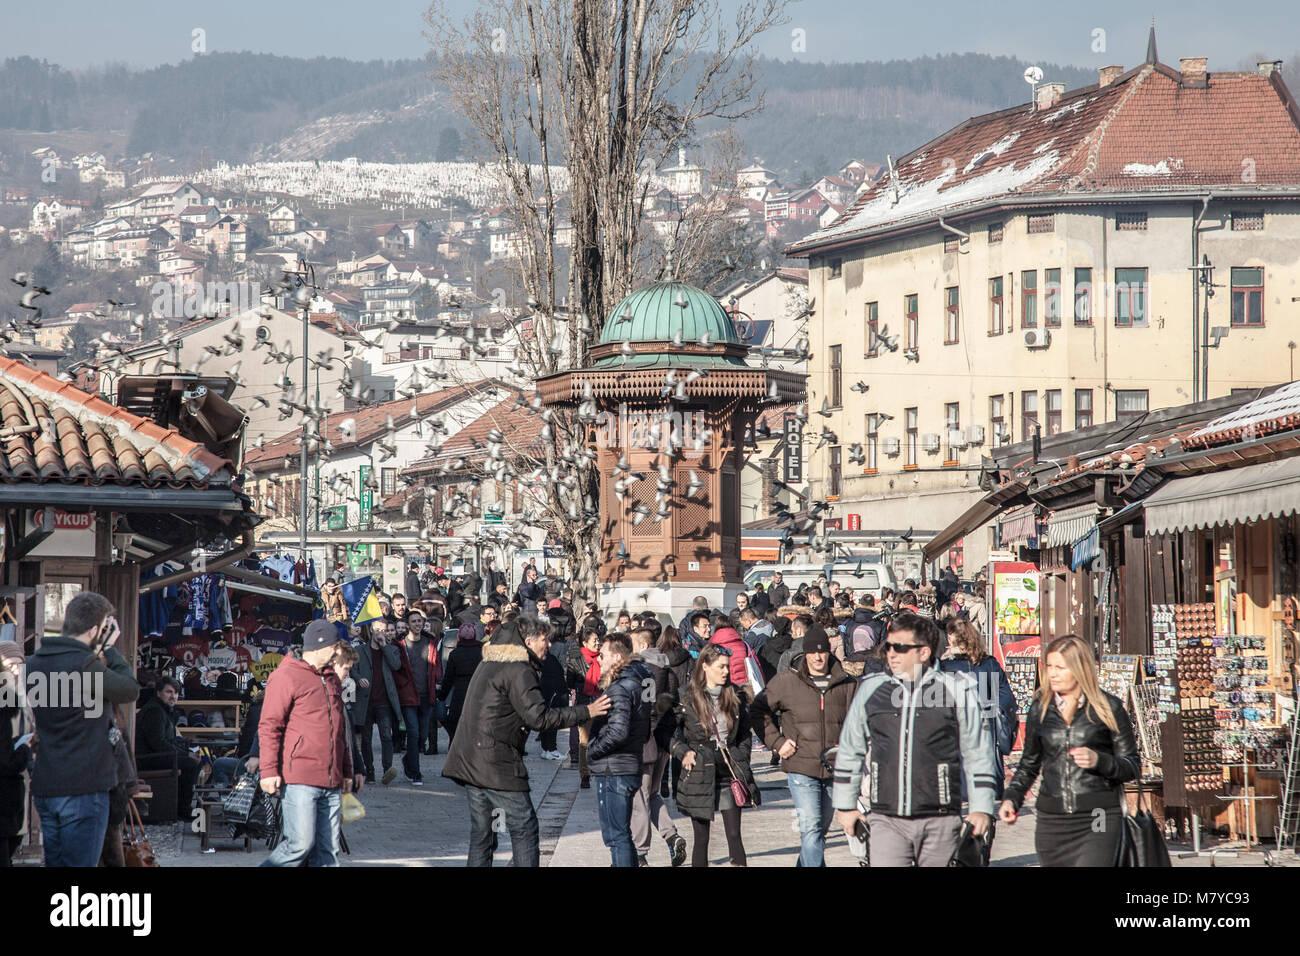 SARAJEVO, BOSNIA AND HERZEGOVINA - FEBRUARY 16, 2018: Pigeons flying over the Bascarsija square Sebilj fountain. - Stock Image